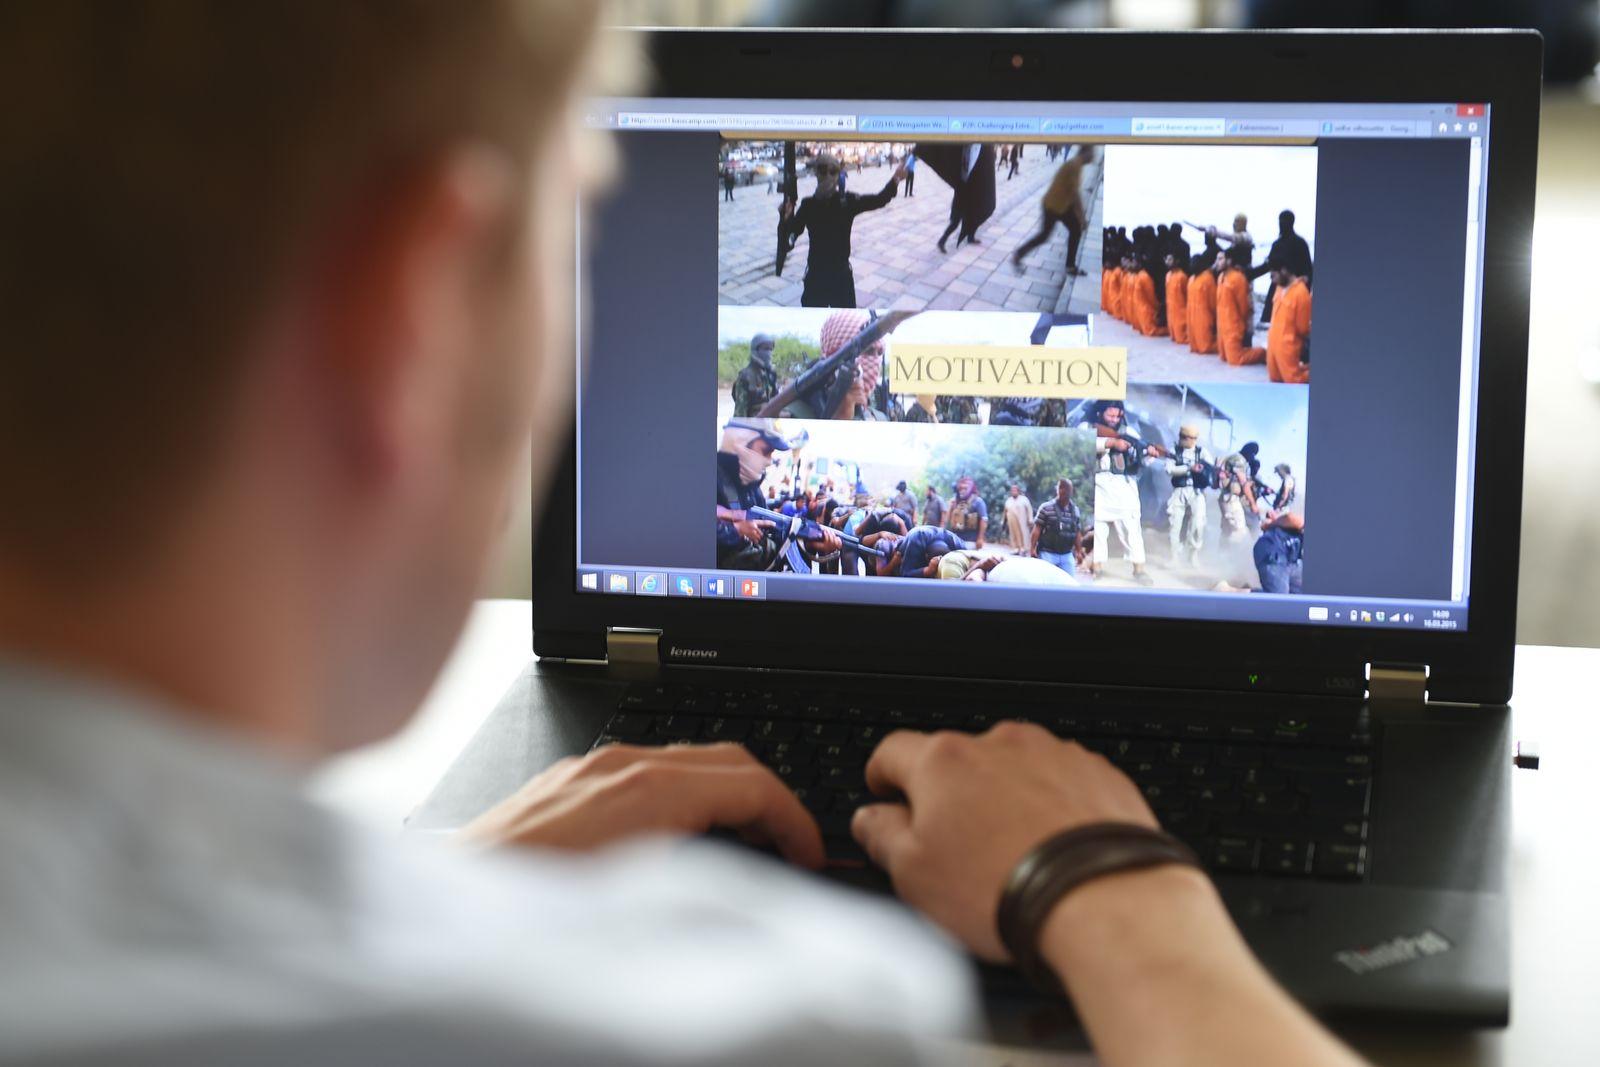 Digitale Kampagne gegen Extremisten in Sozialen Netzwerken